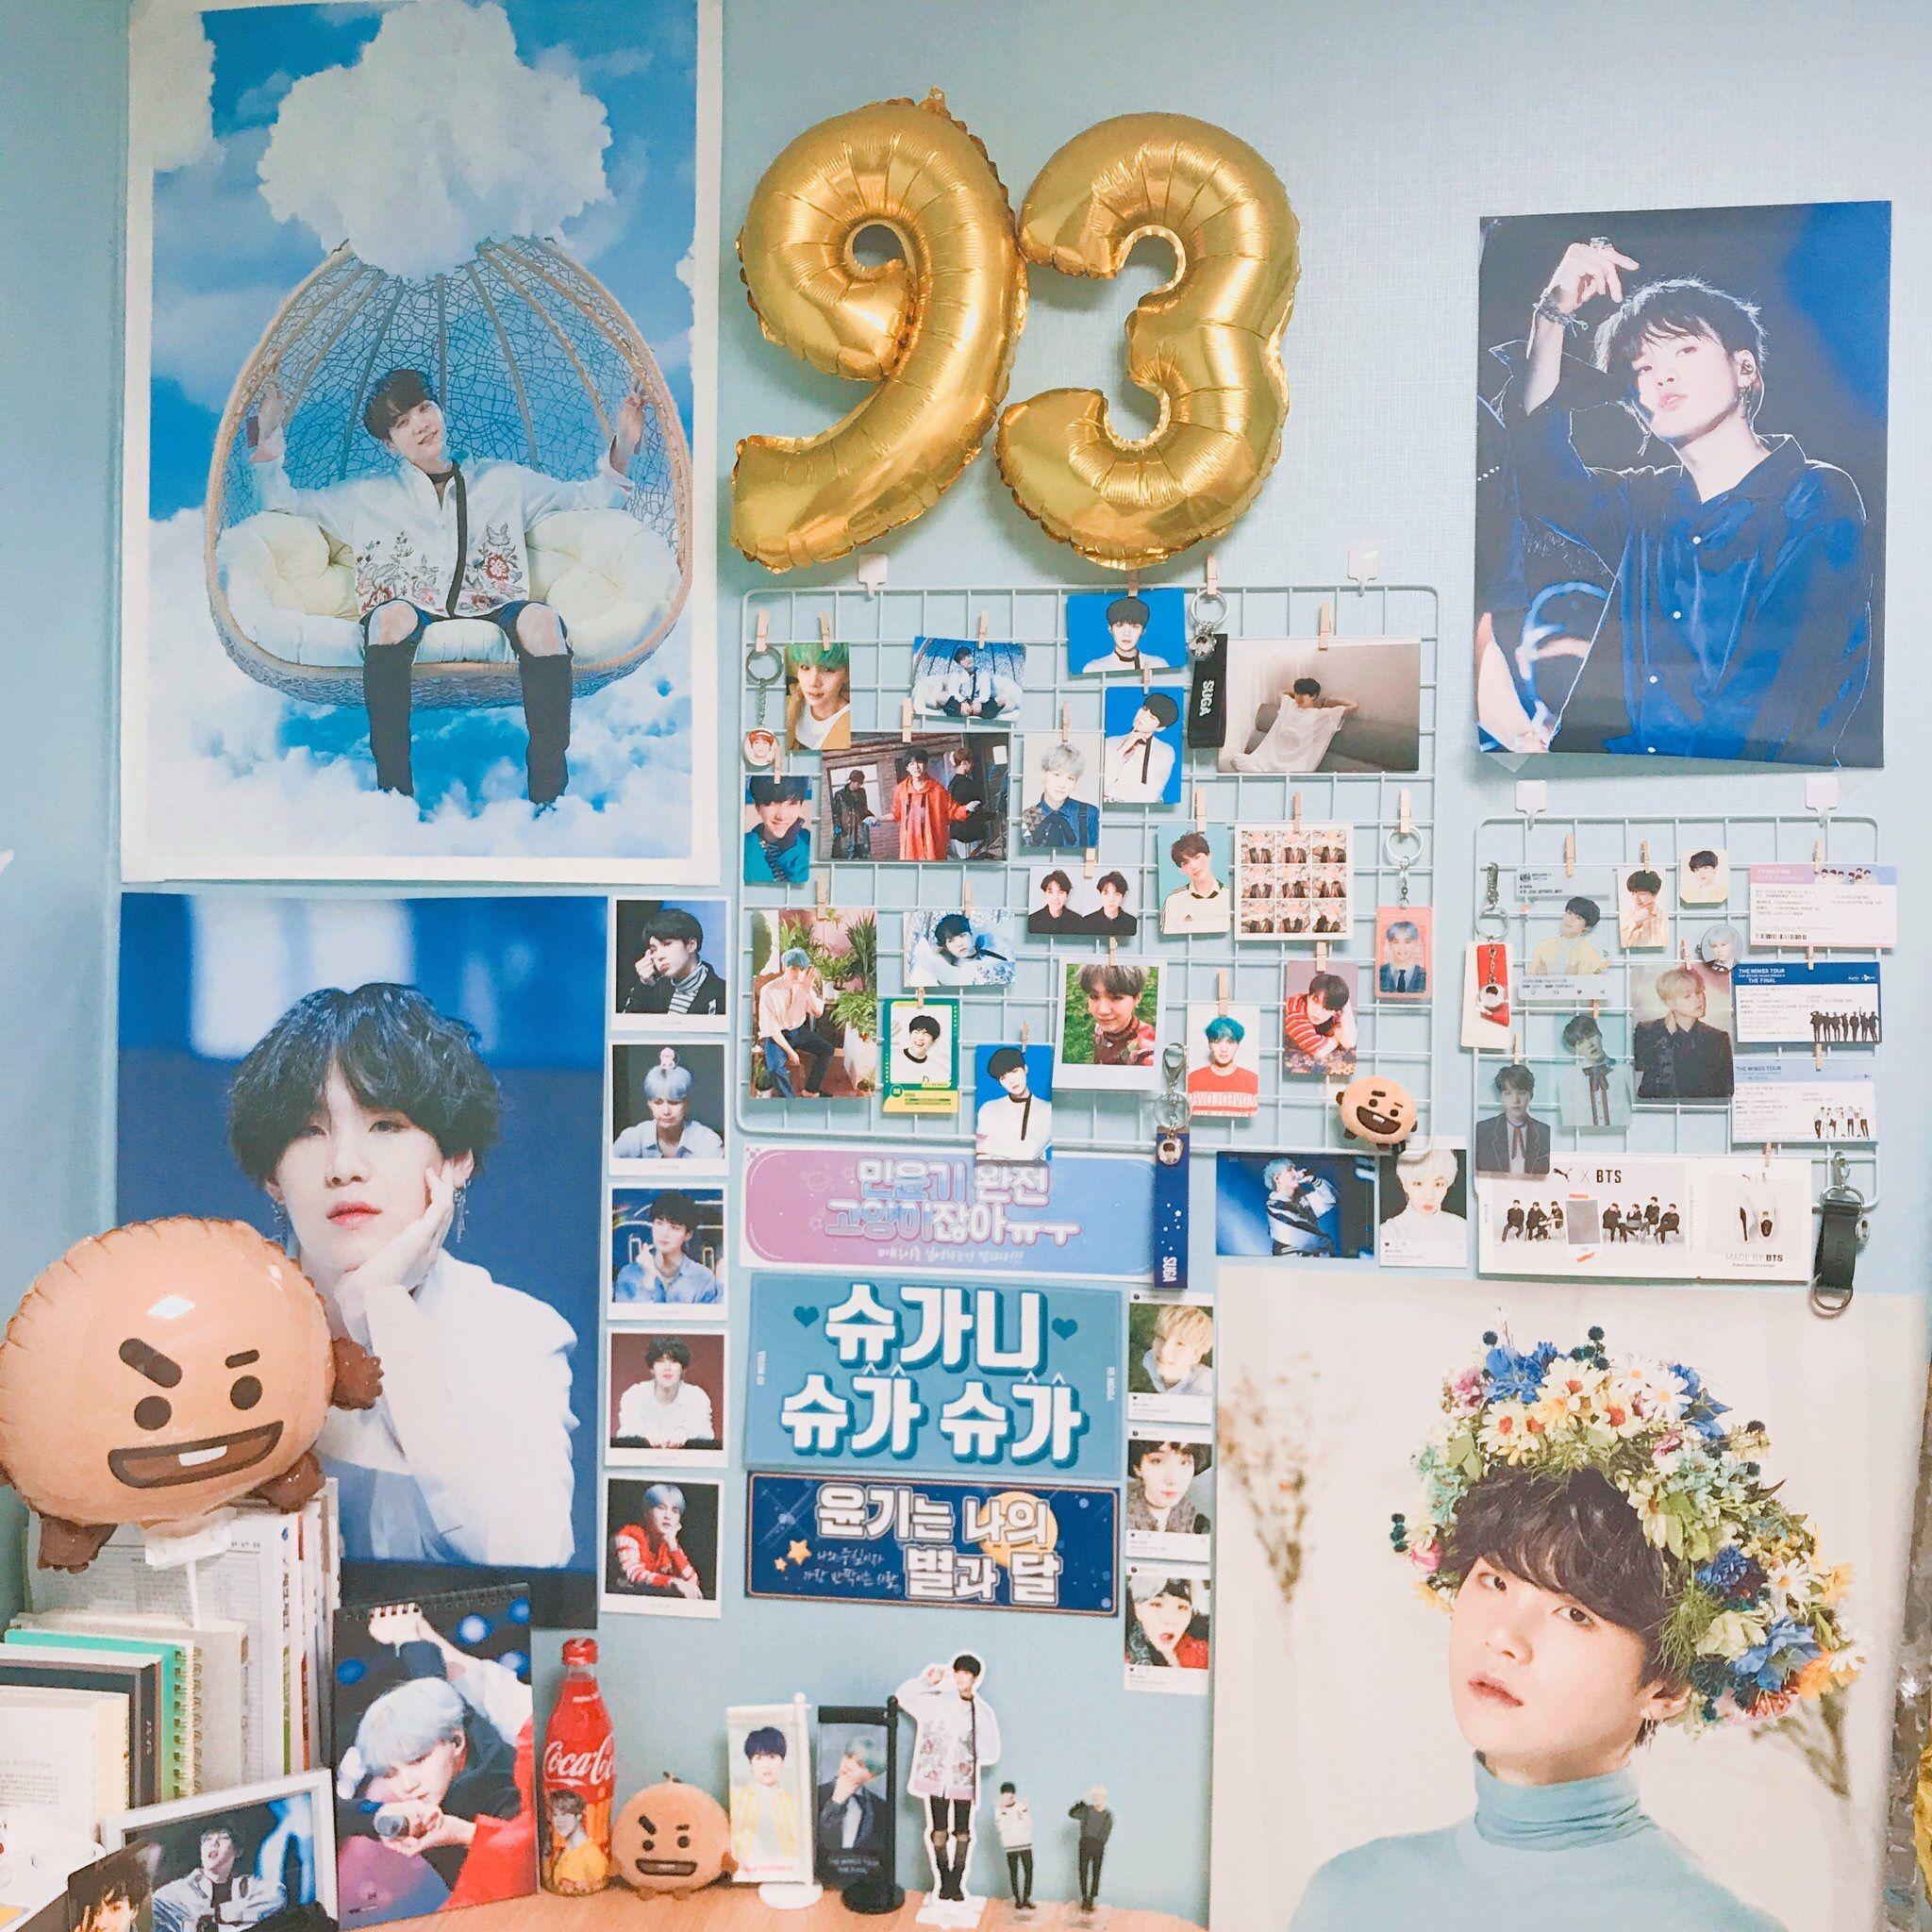 Bts wallpaper for room